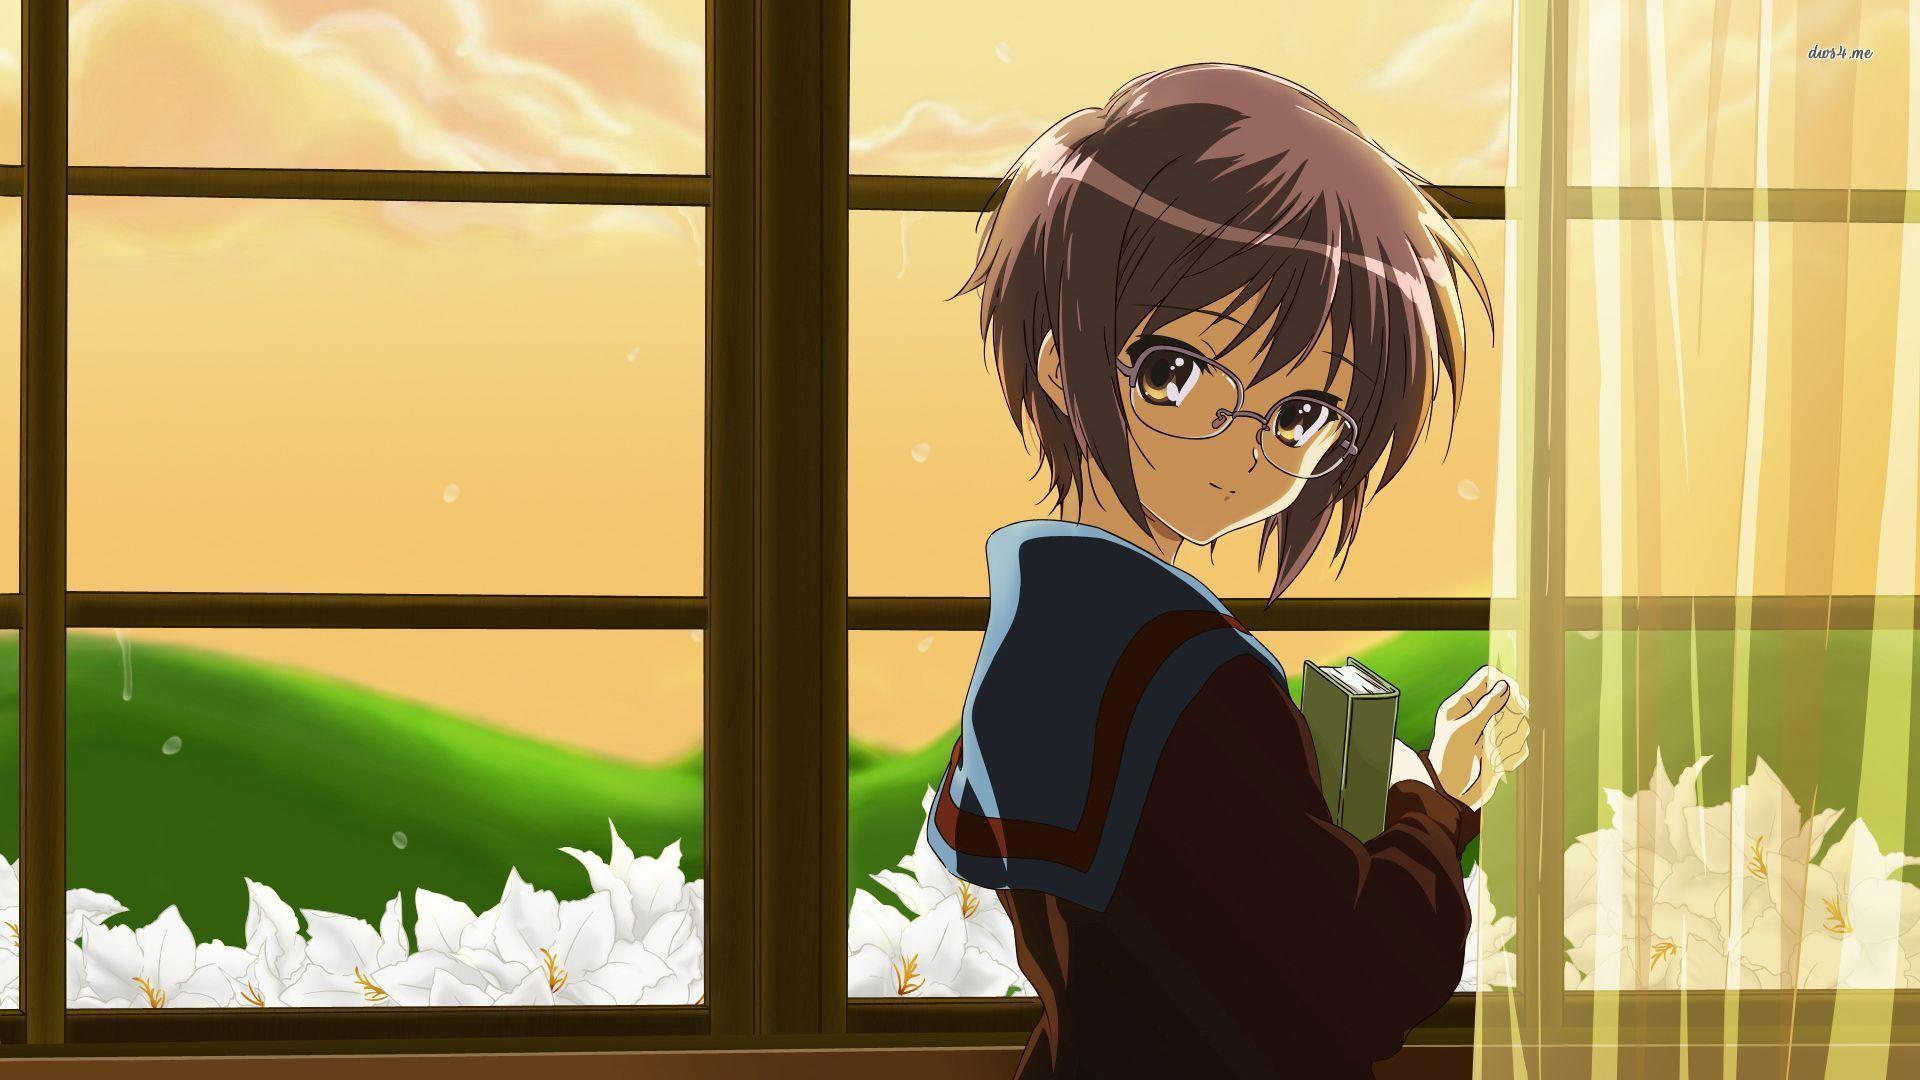 Yuki Nagato The Melancholy Of Haruhi Suzumiya Anime Wallpaper Hd Imashon Com Anime Wallpaper Anime Yuki